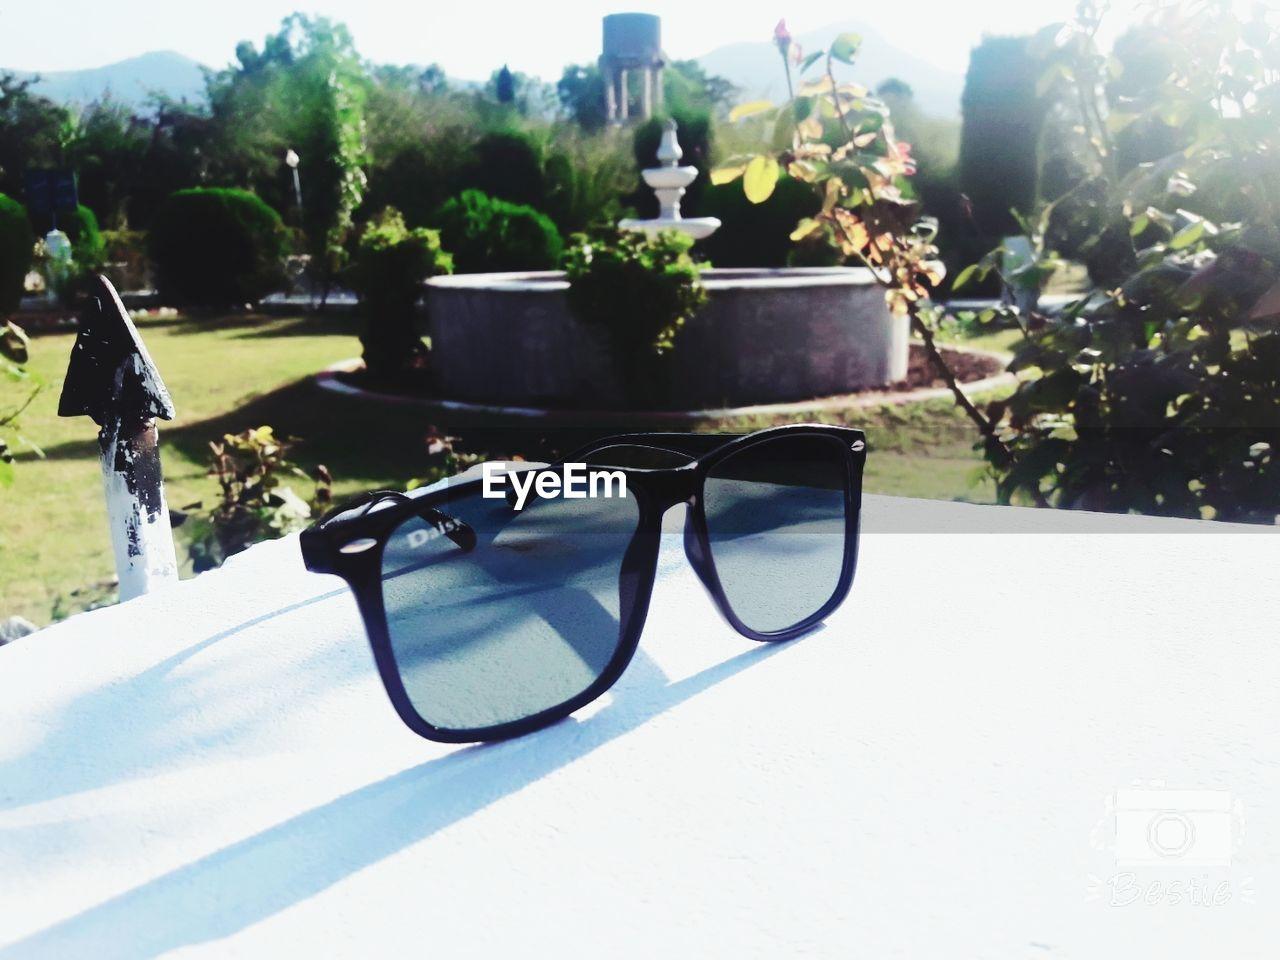 sunglasses, eyeglasses, eyewear, sunlight, summer, tree, no people, reflection, day, outdoors, eyesight, glasses, nature, close-up, sky